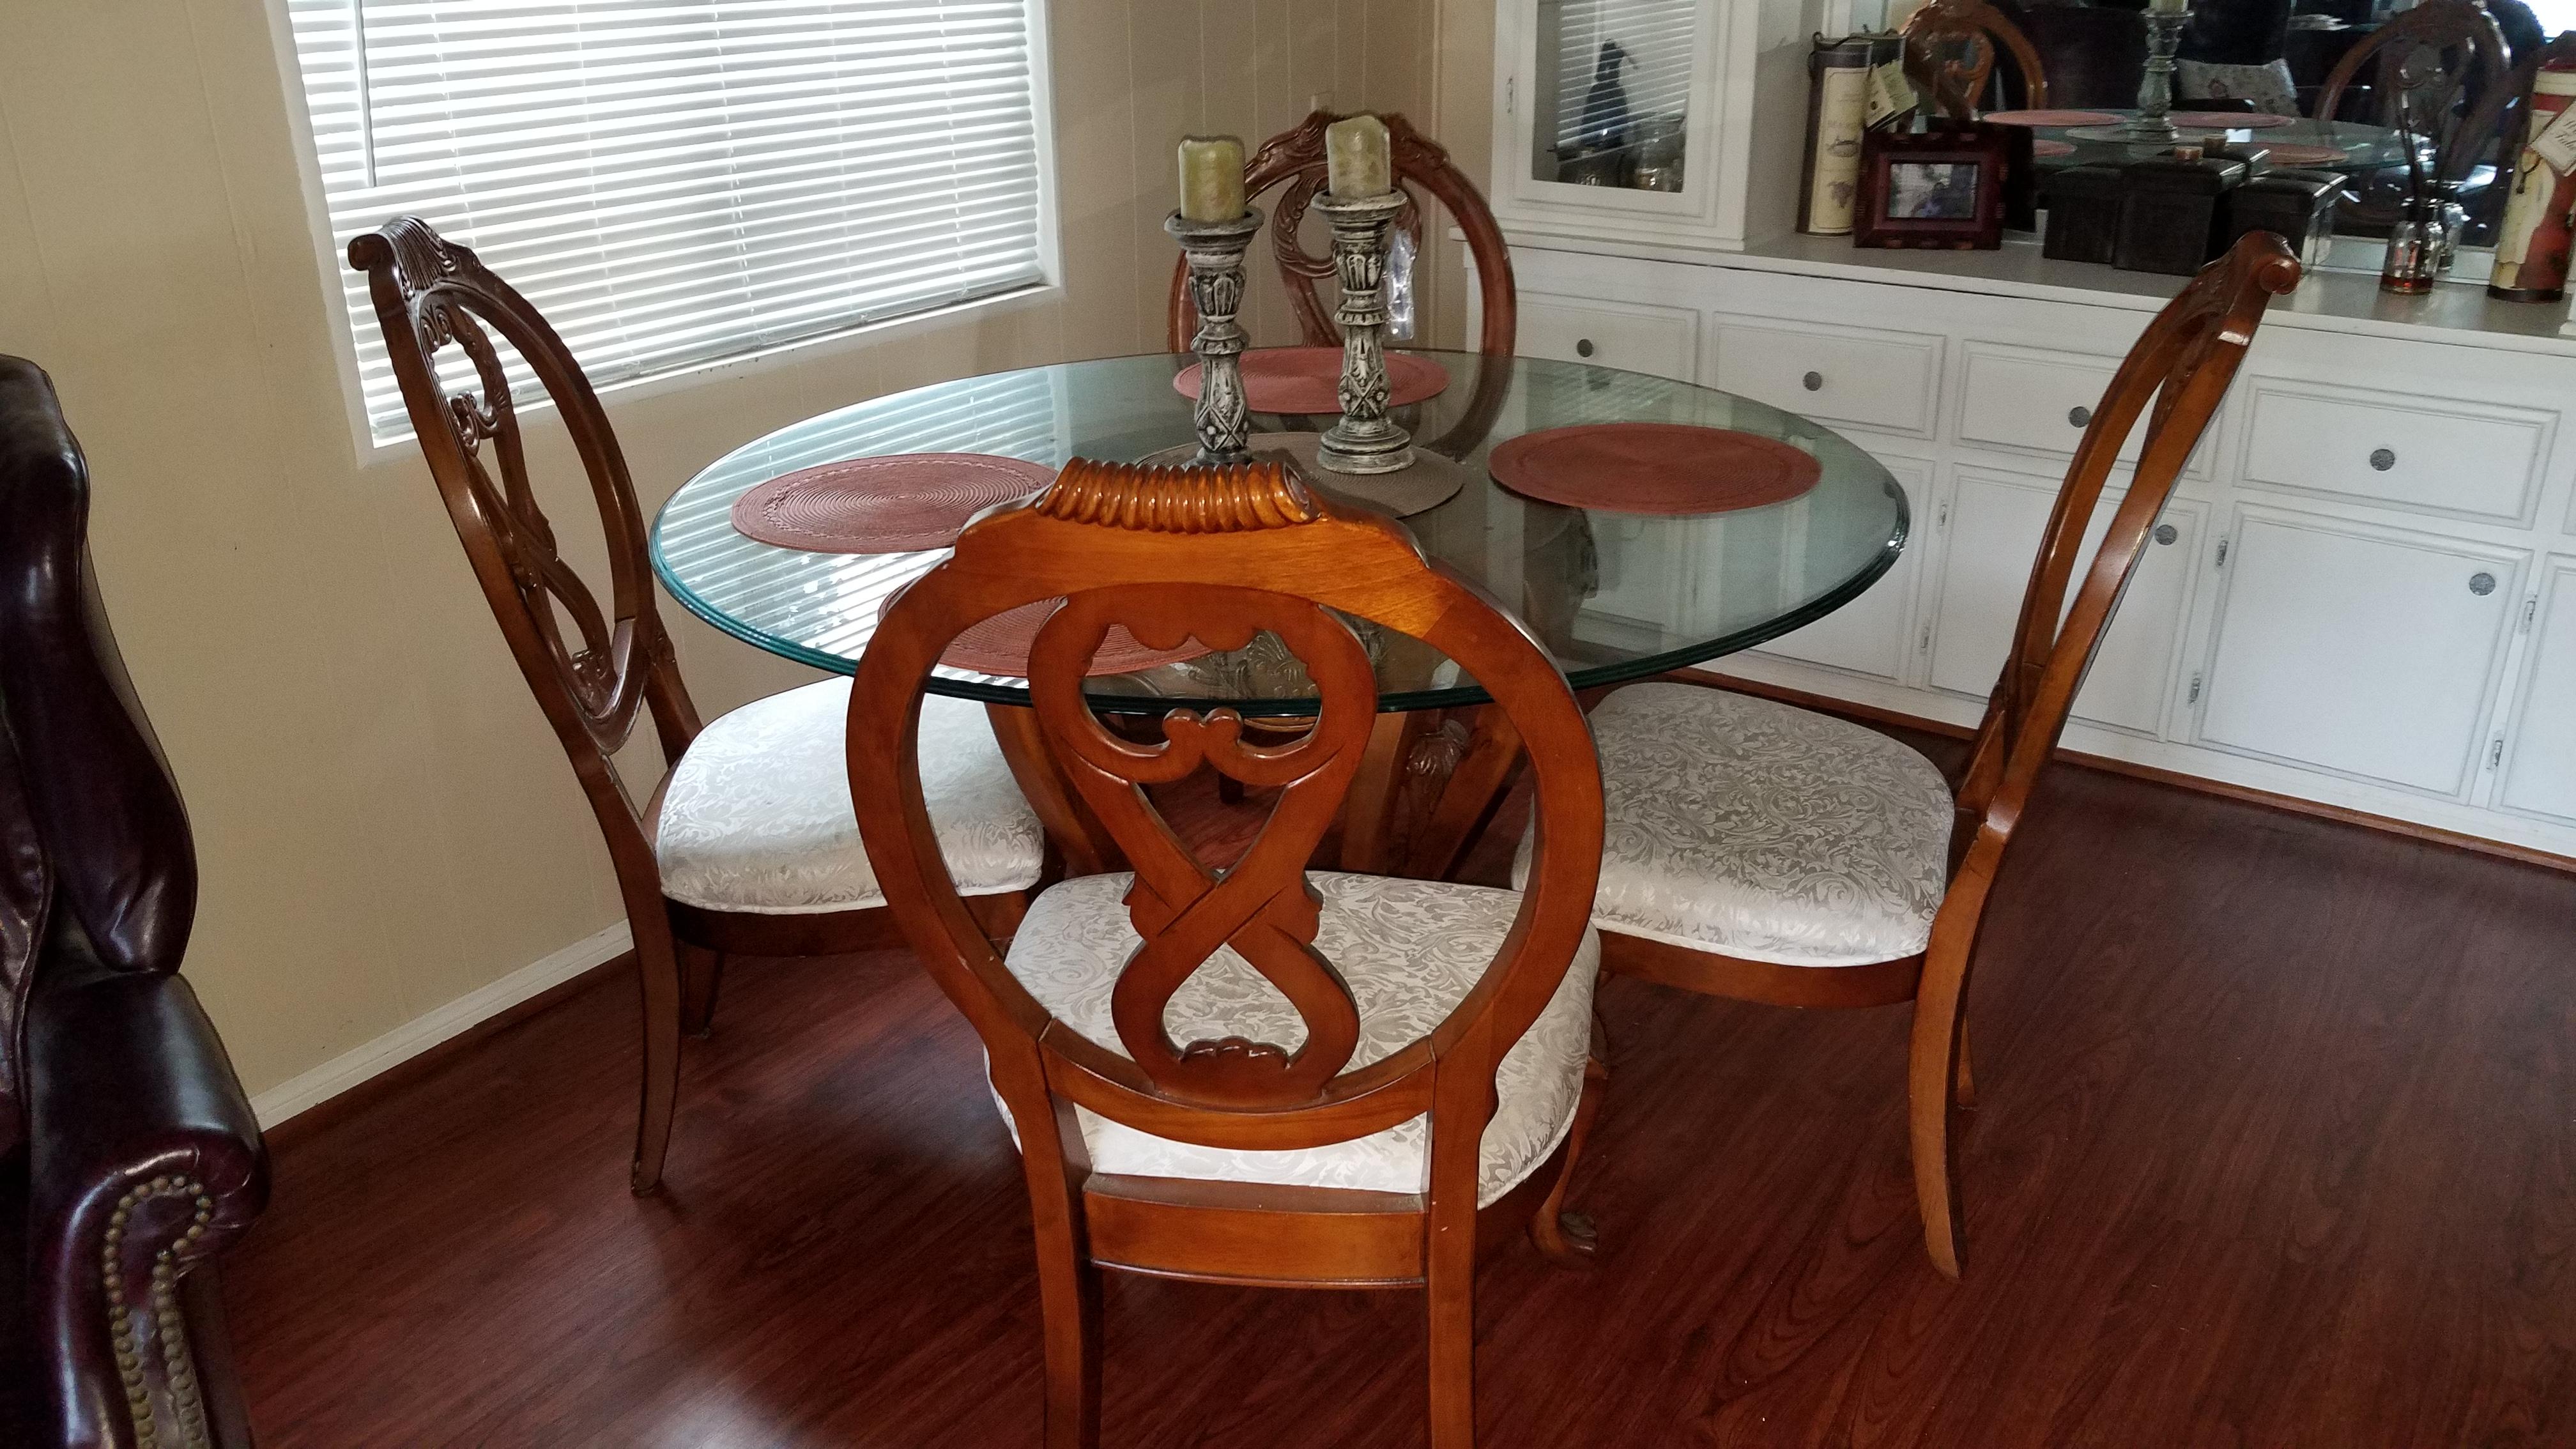 Saturday June 15th 8am 12pm Large furniture items